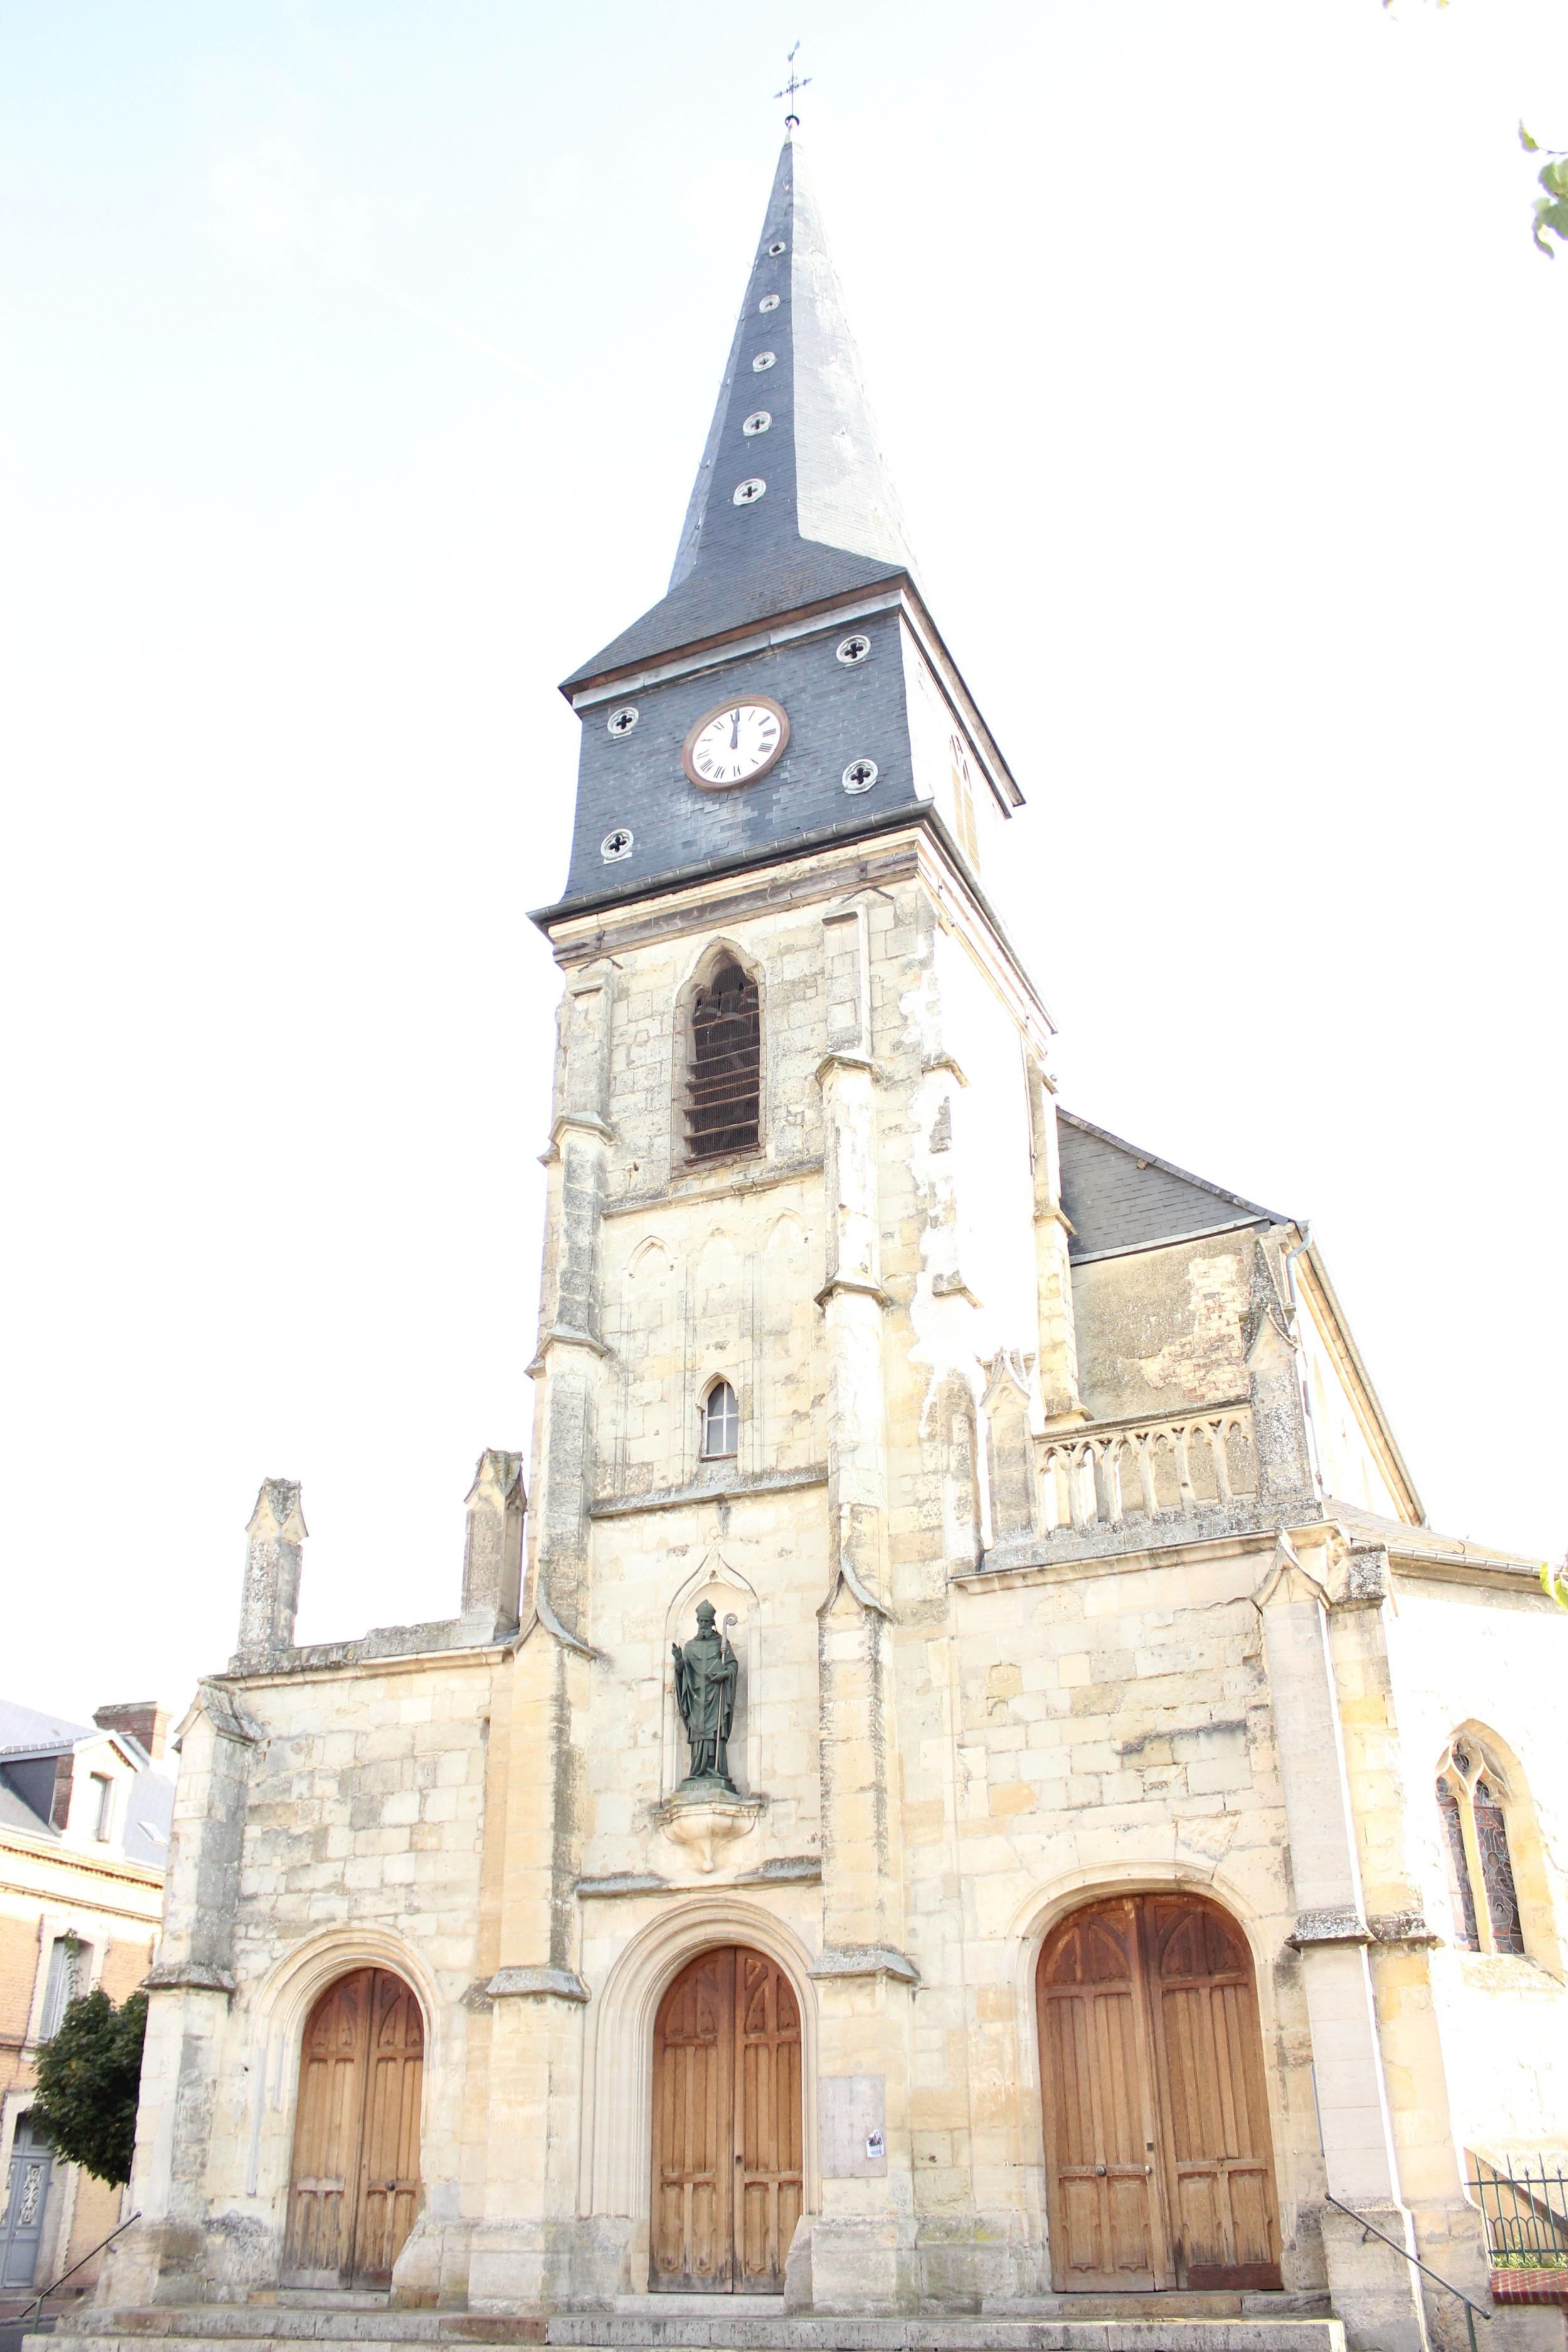 L'Eglise de Livarot